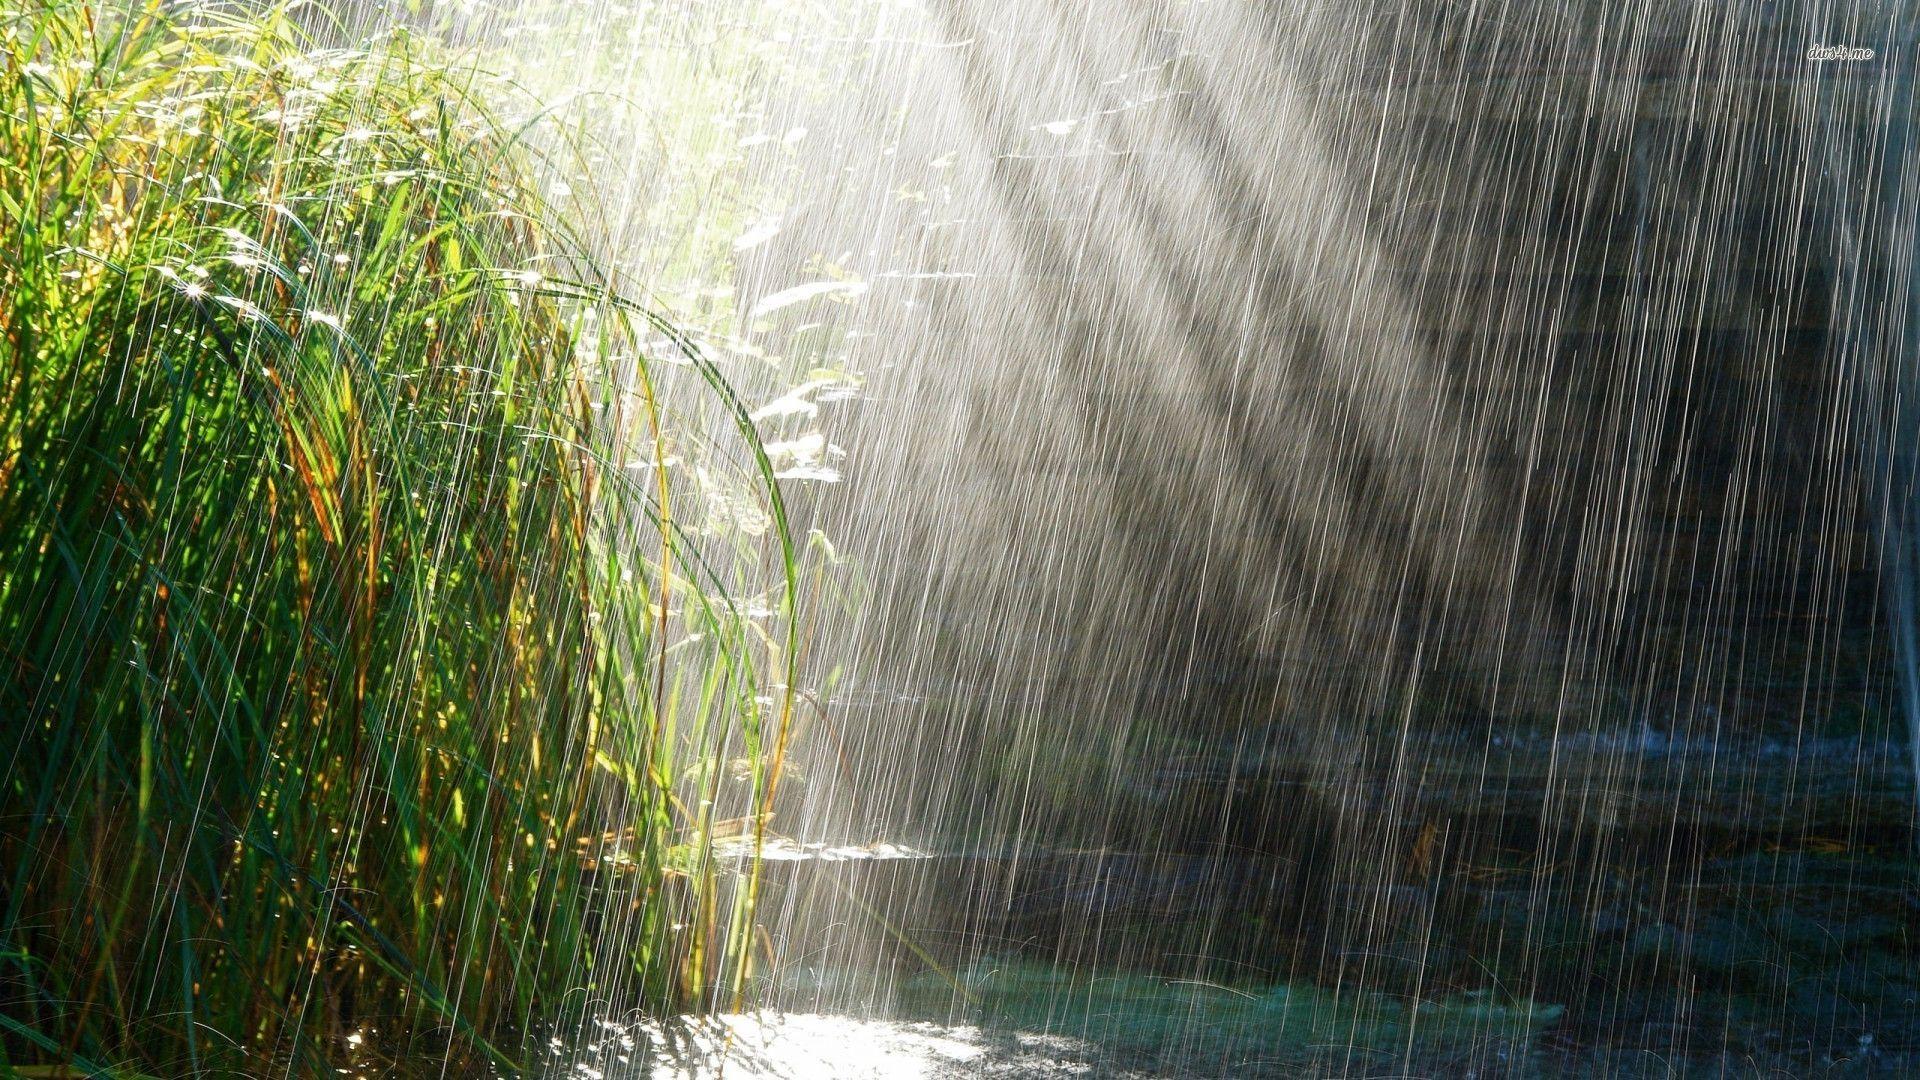 Raining At The Pond Wallpapers Hd Free 441523 Rainy Day Wallpaper Rain Wallpapers New Nature Wallpaper